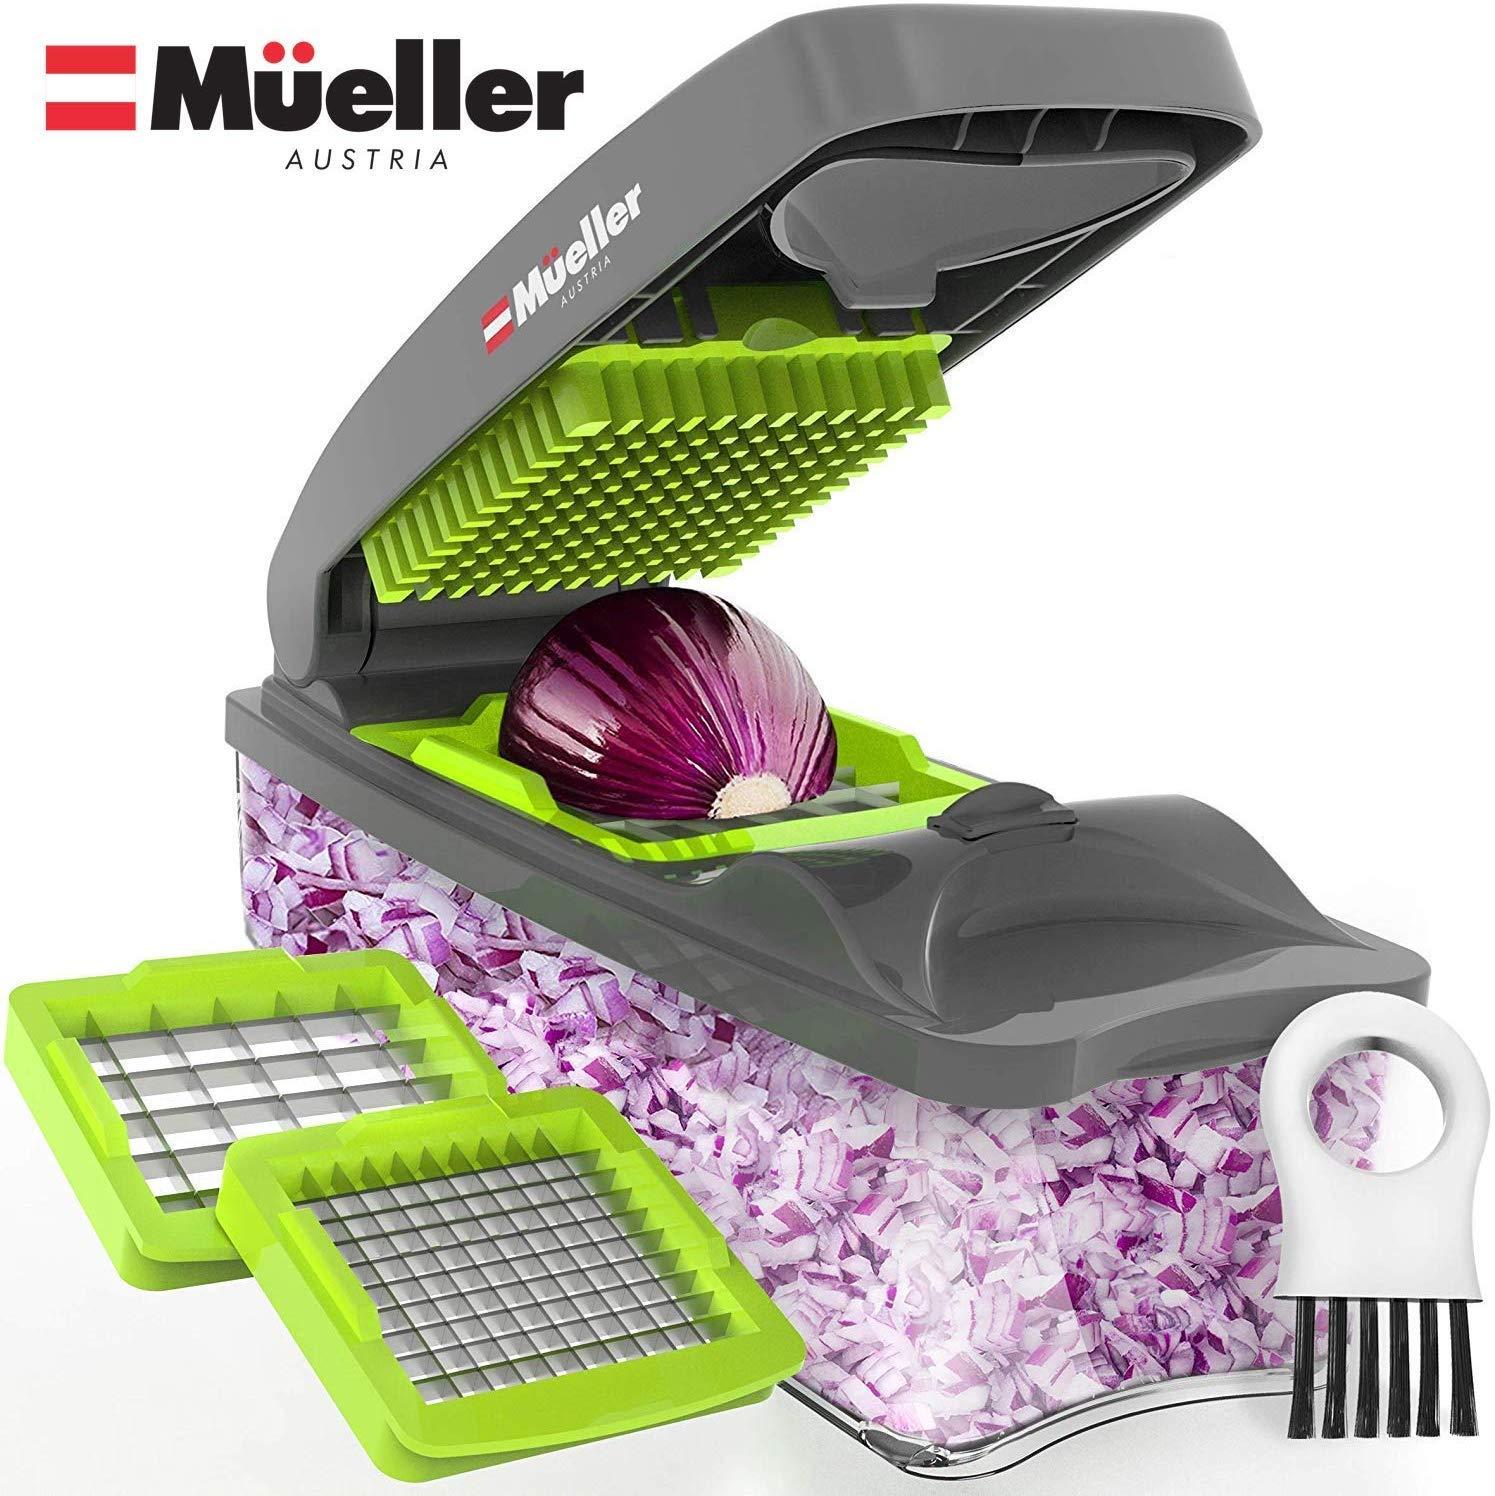 Mueller Onion Chopper Pro Vegetable Chopper: